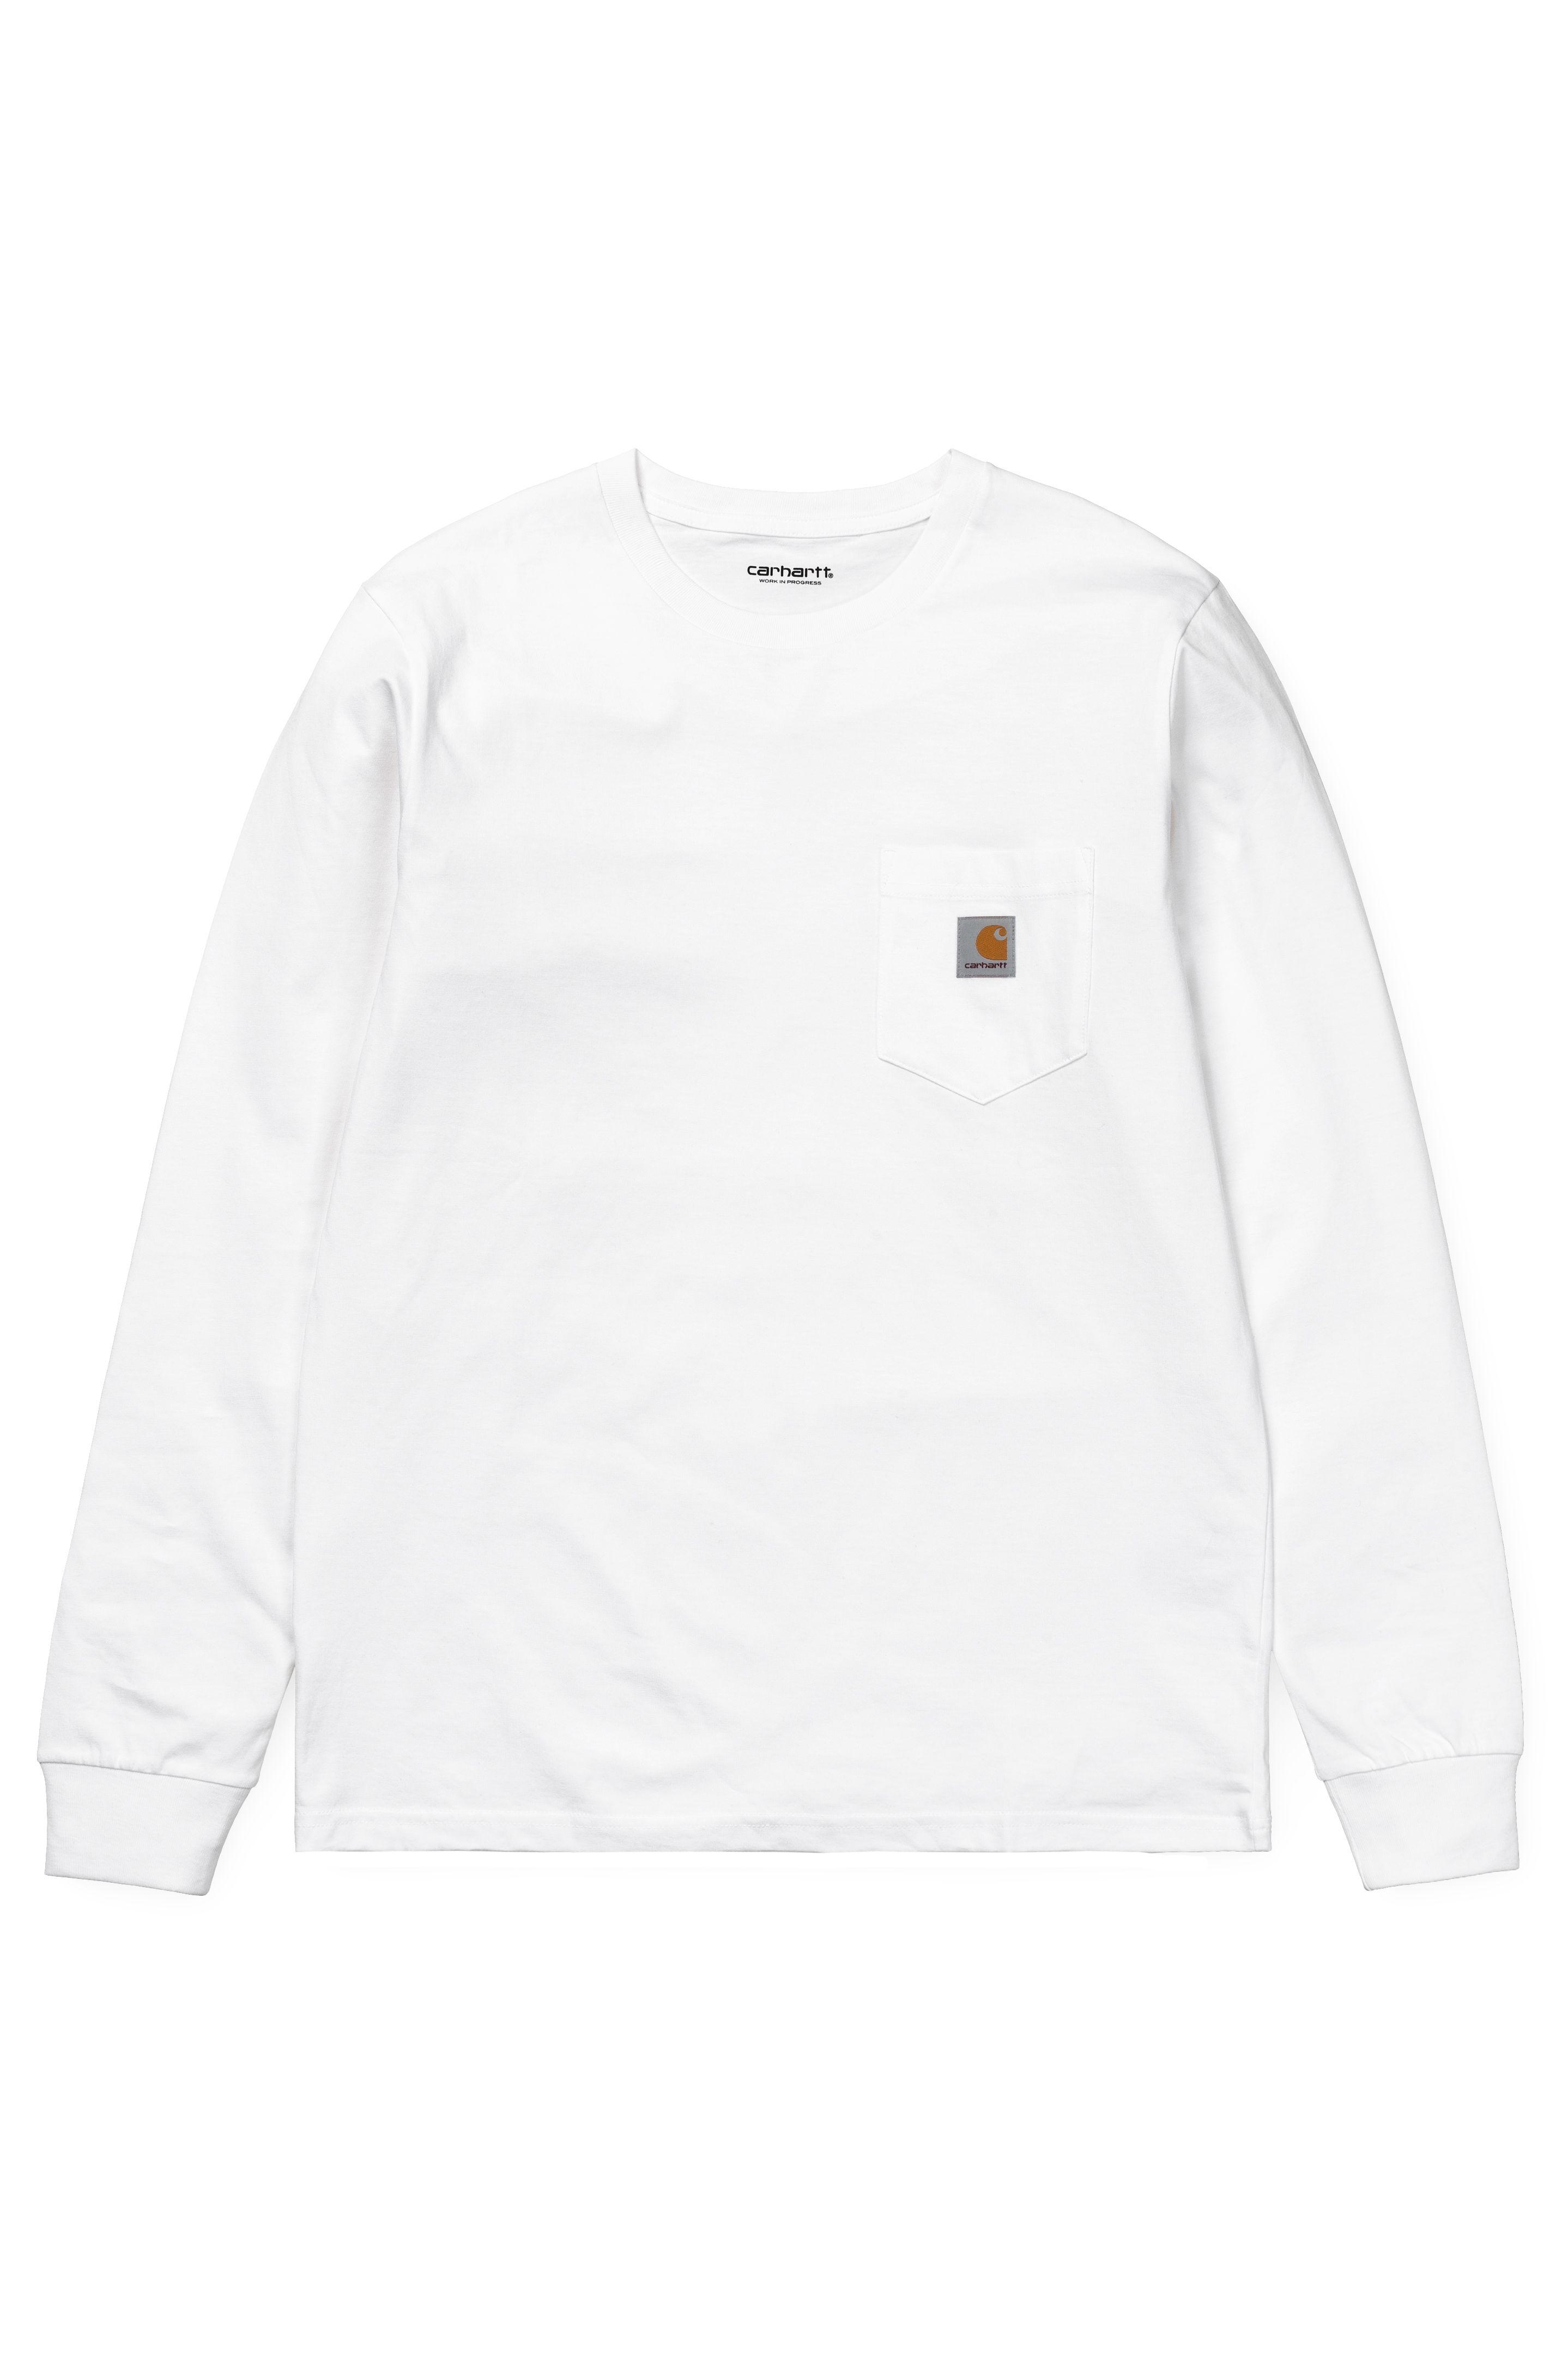 Carhartt WIP L-Sleeve POCKET White